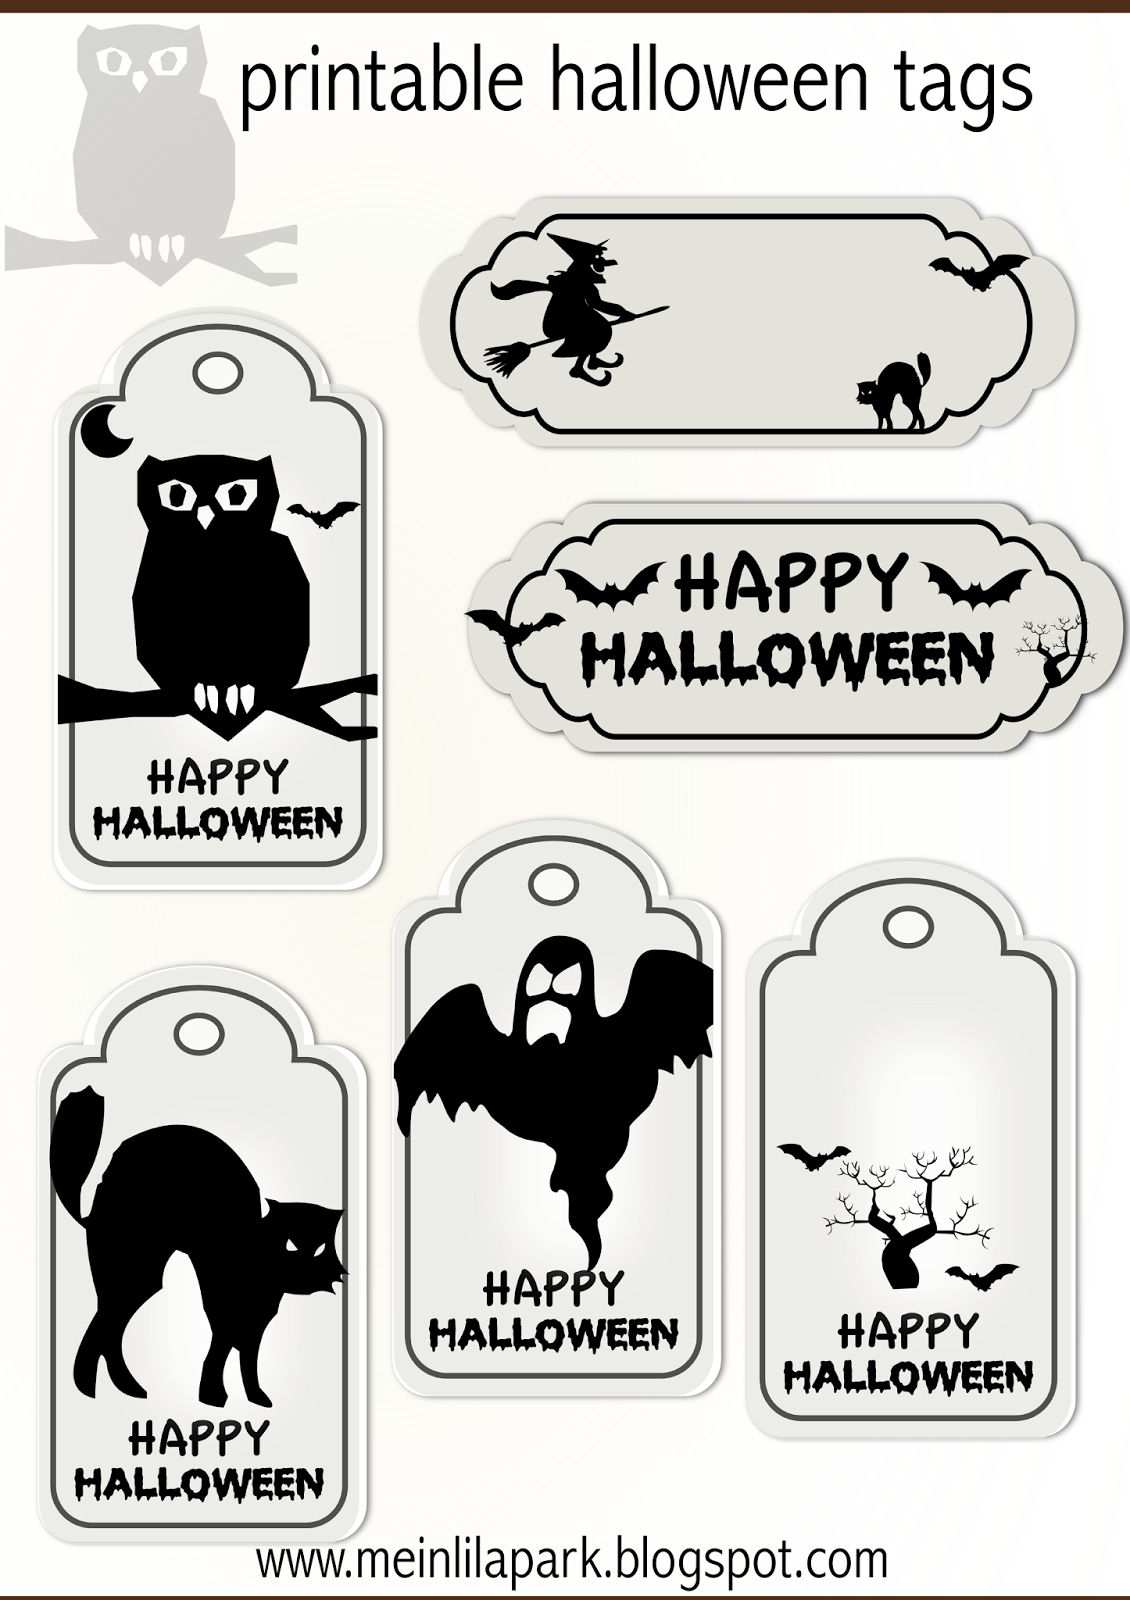 Free Printable Halloween Tags - Druckvorlage Halloween - Freebie - Free Printable Halloween Decorations